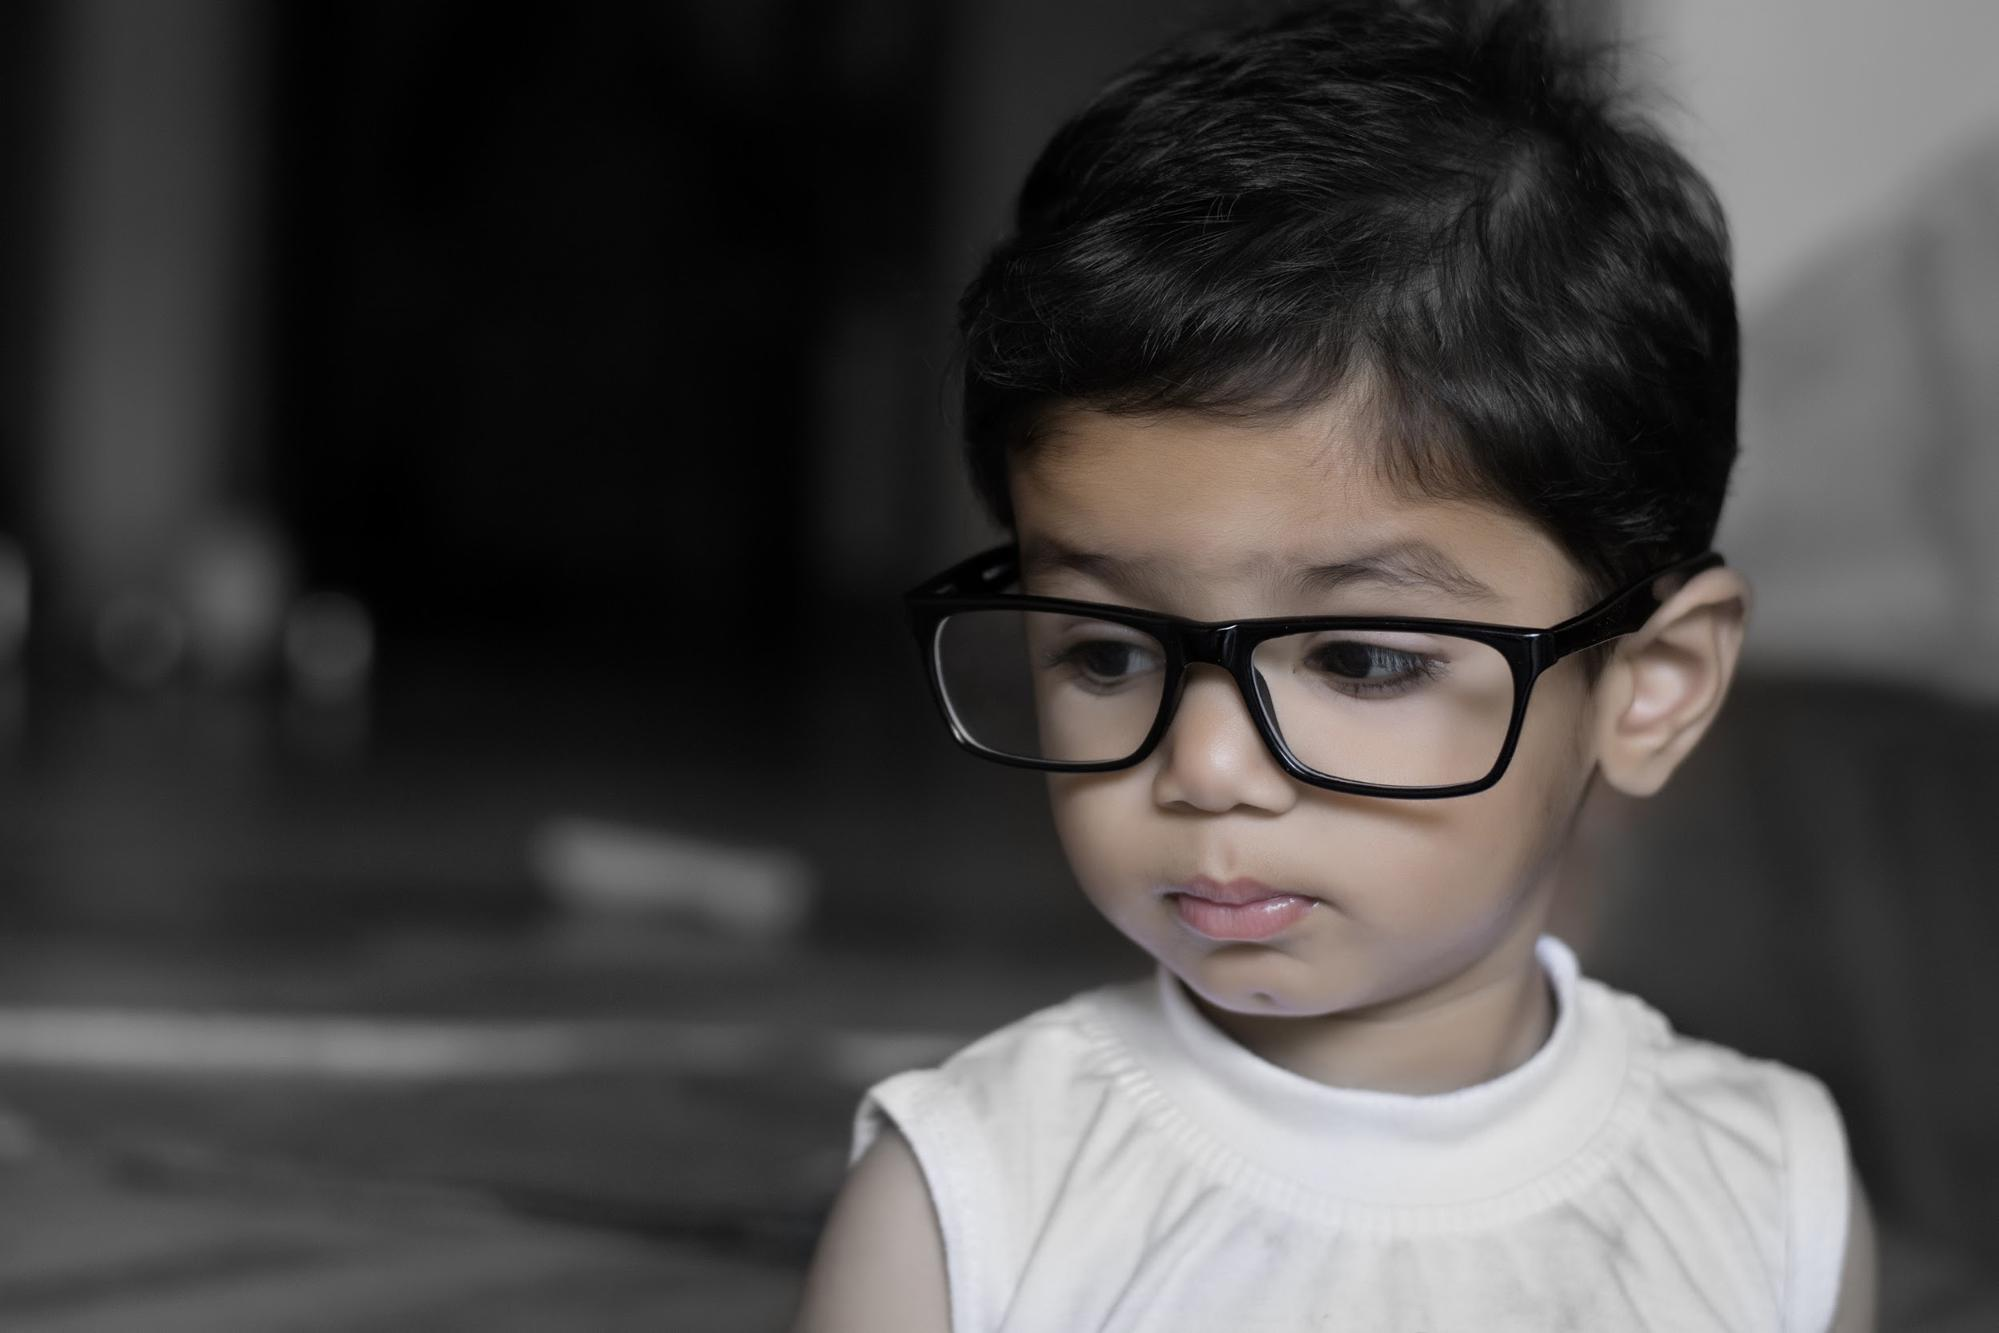 toddler in glasses ignoring body language